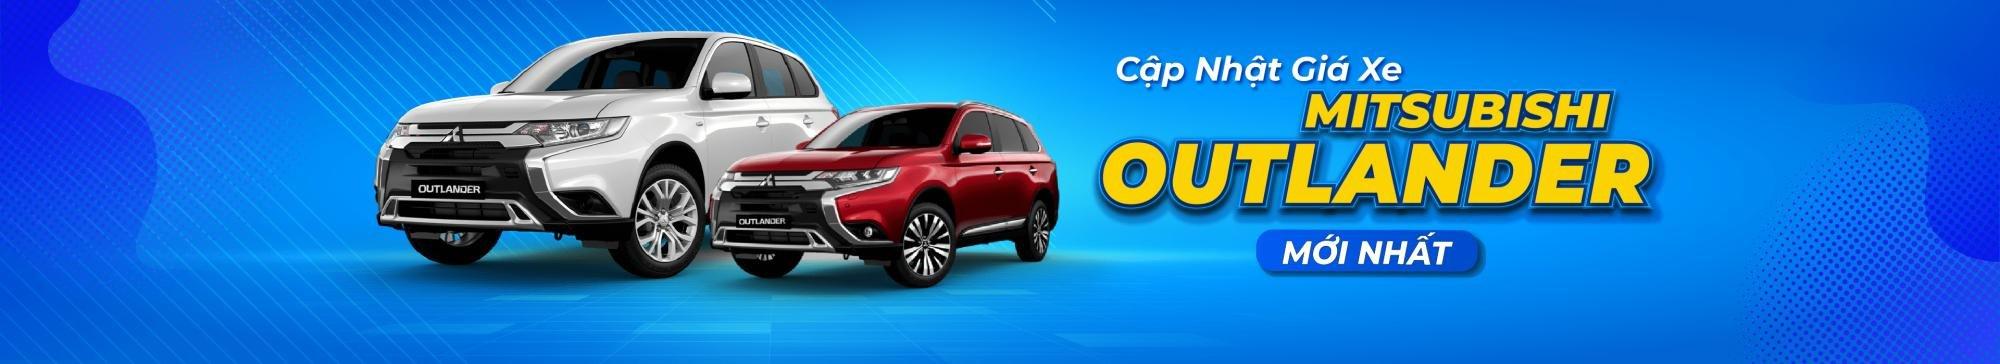 Giá xe Mitsubishi Outlander web Home